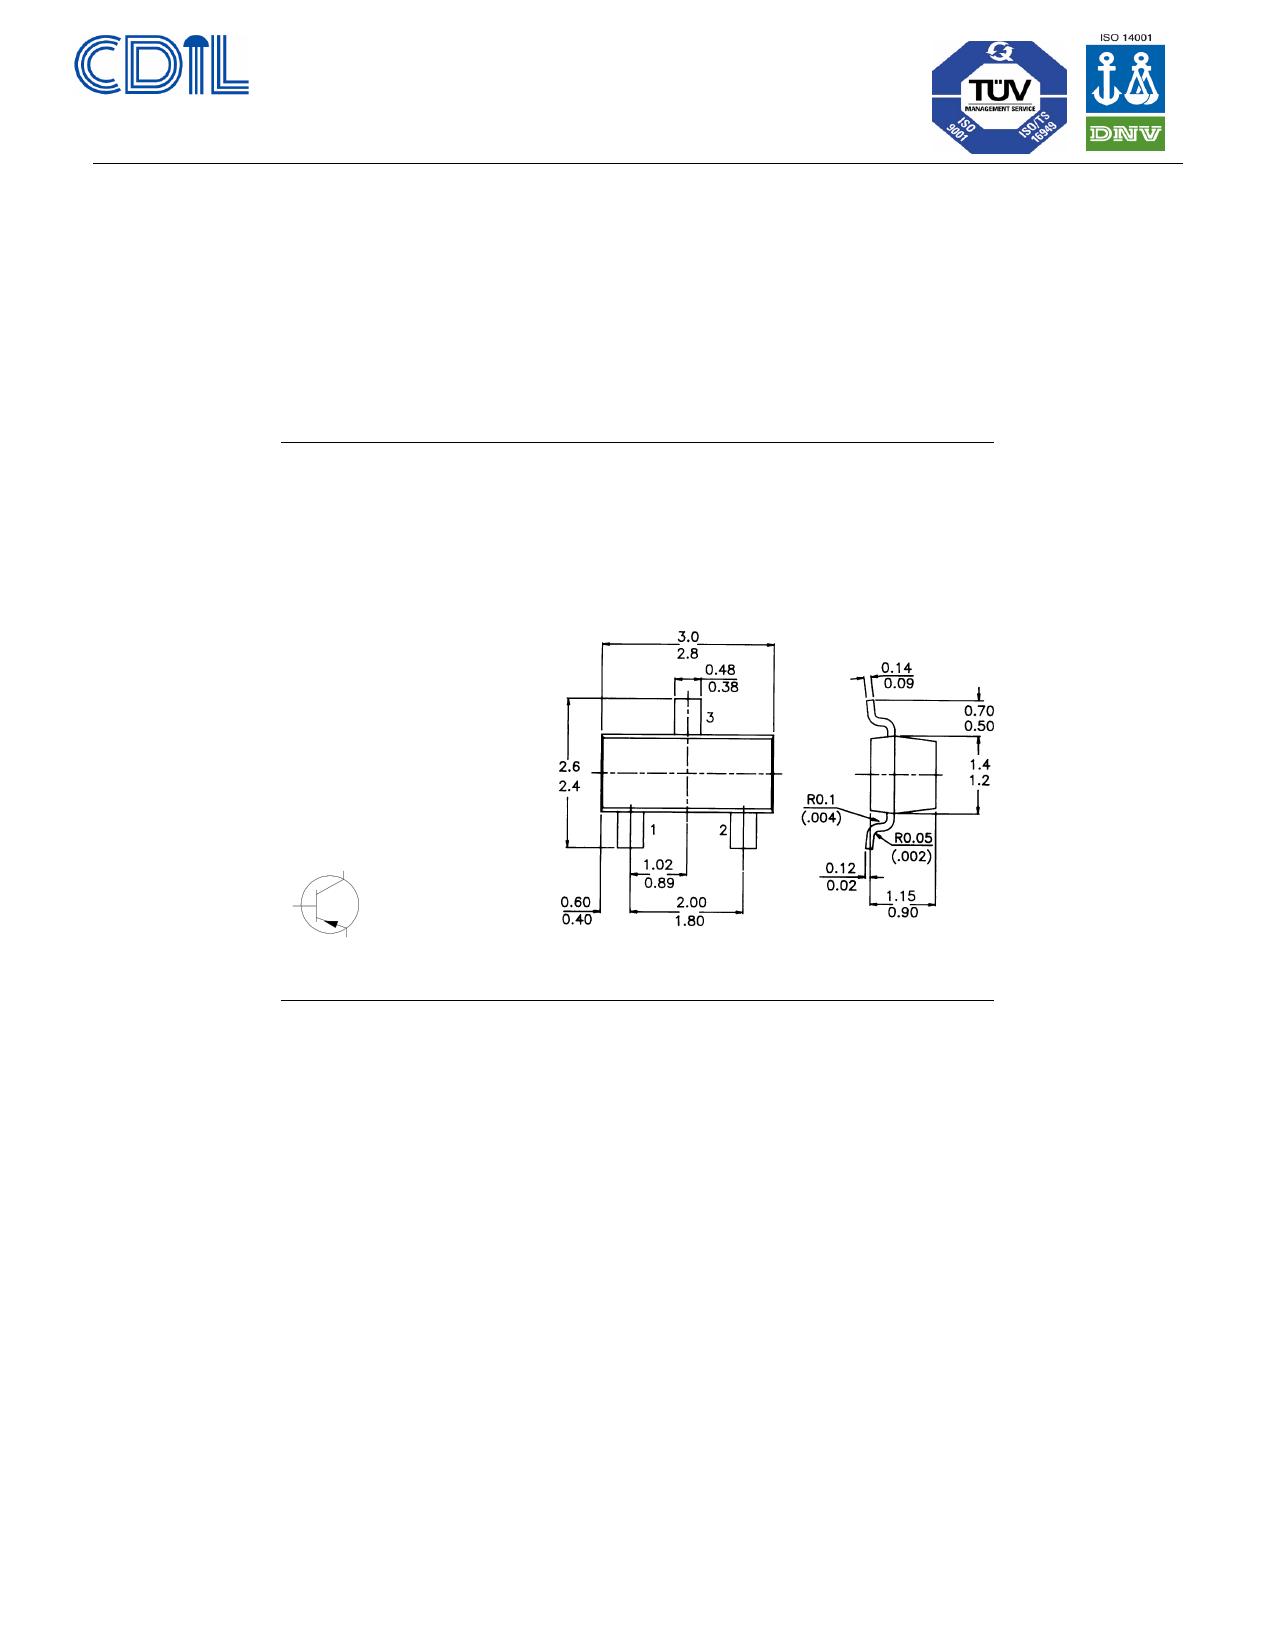 BCX71K 데이터시트 및 BCX71K PDF